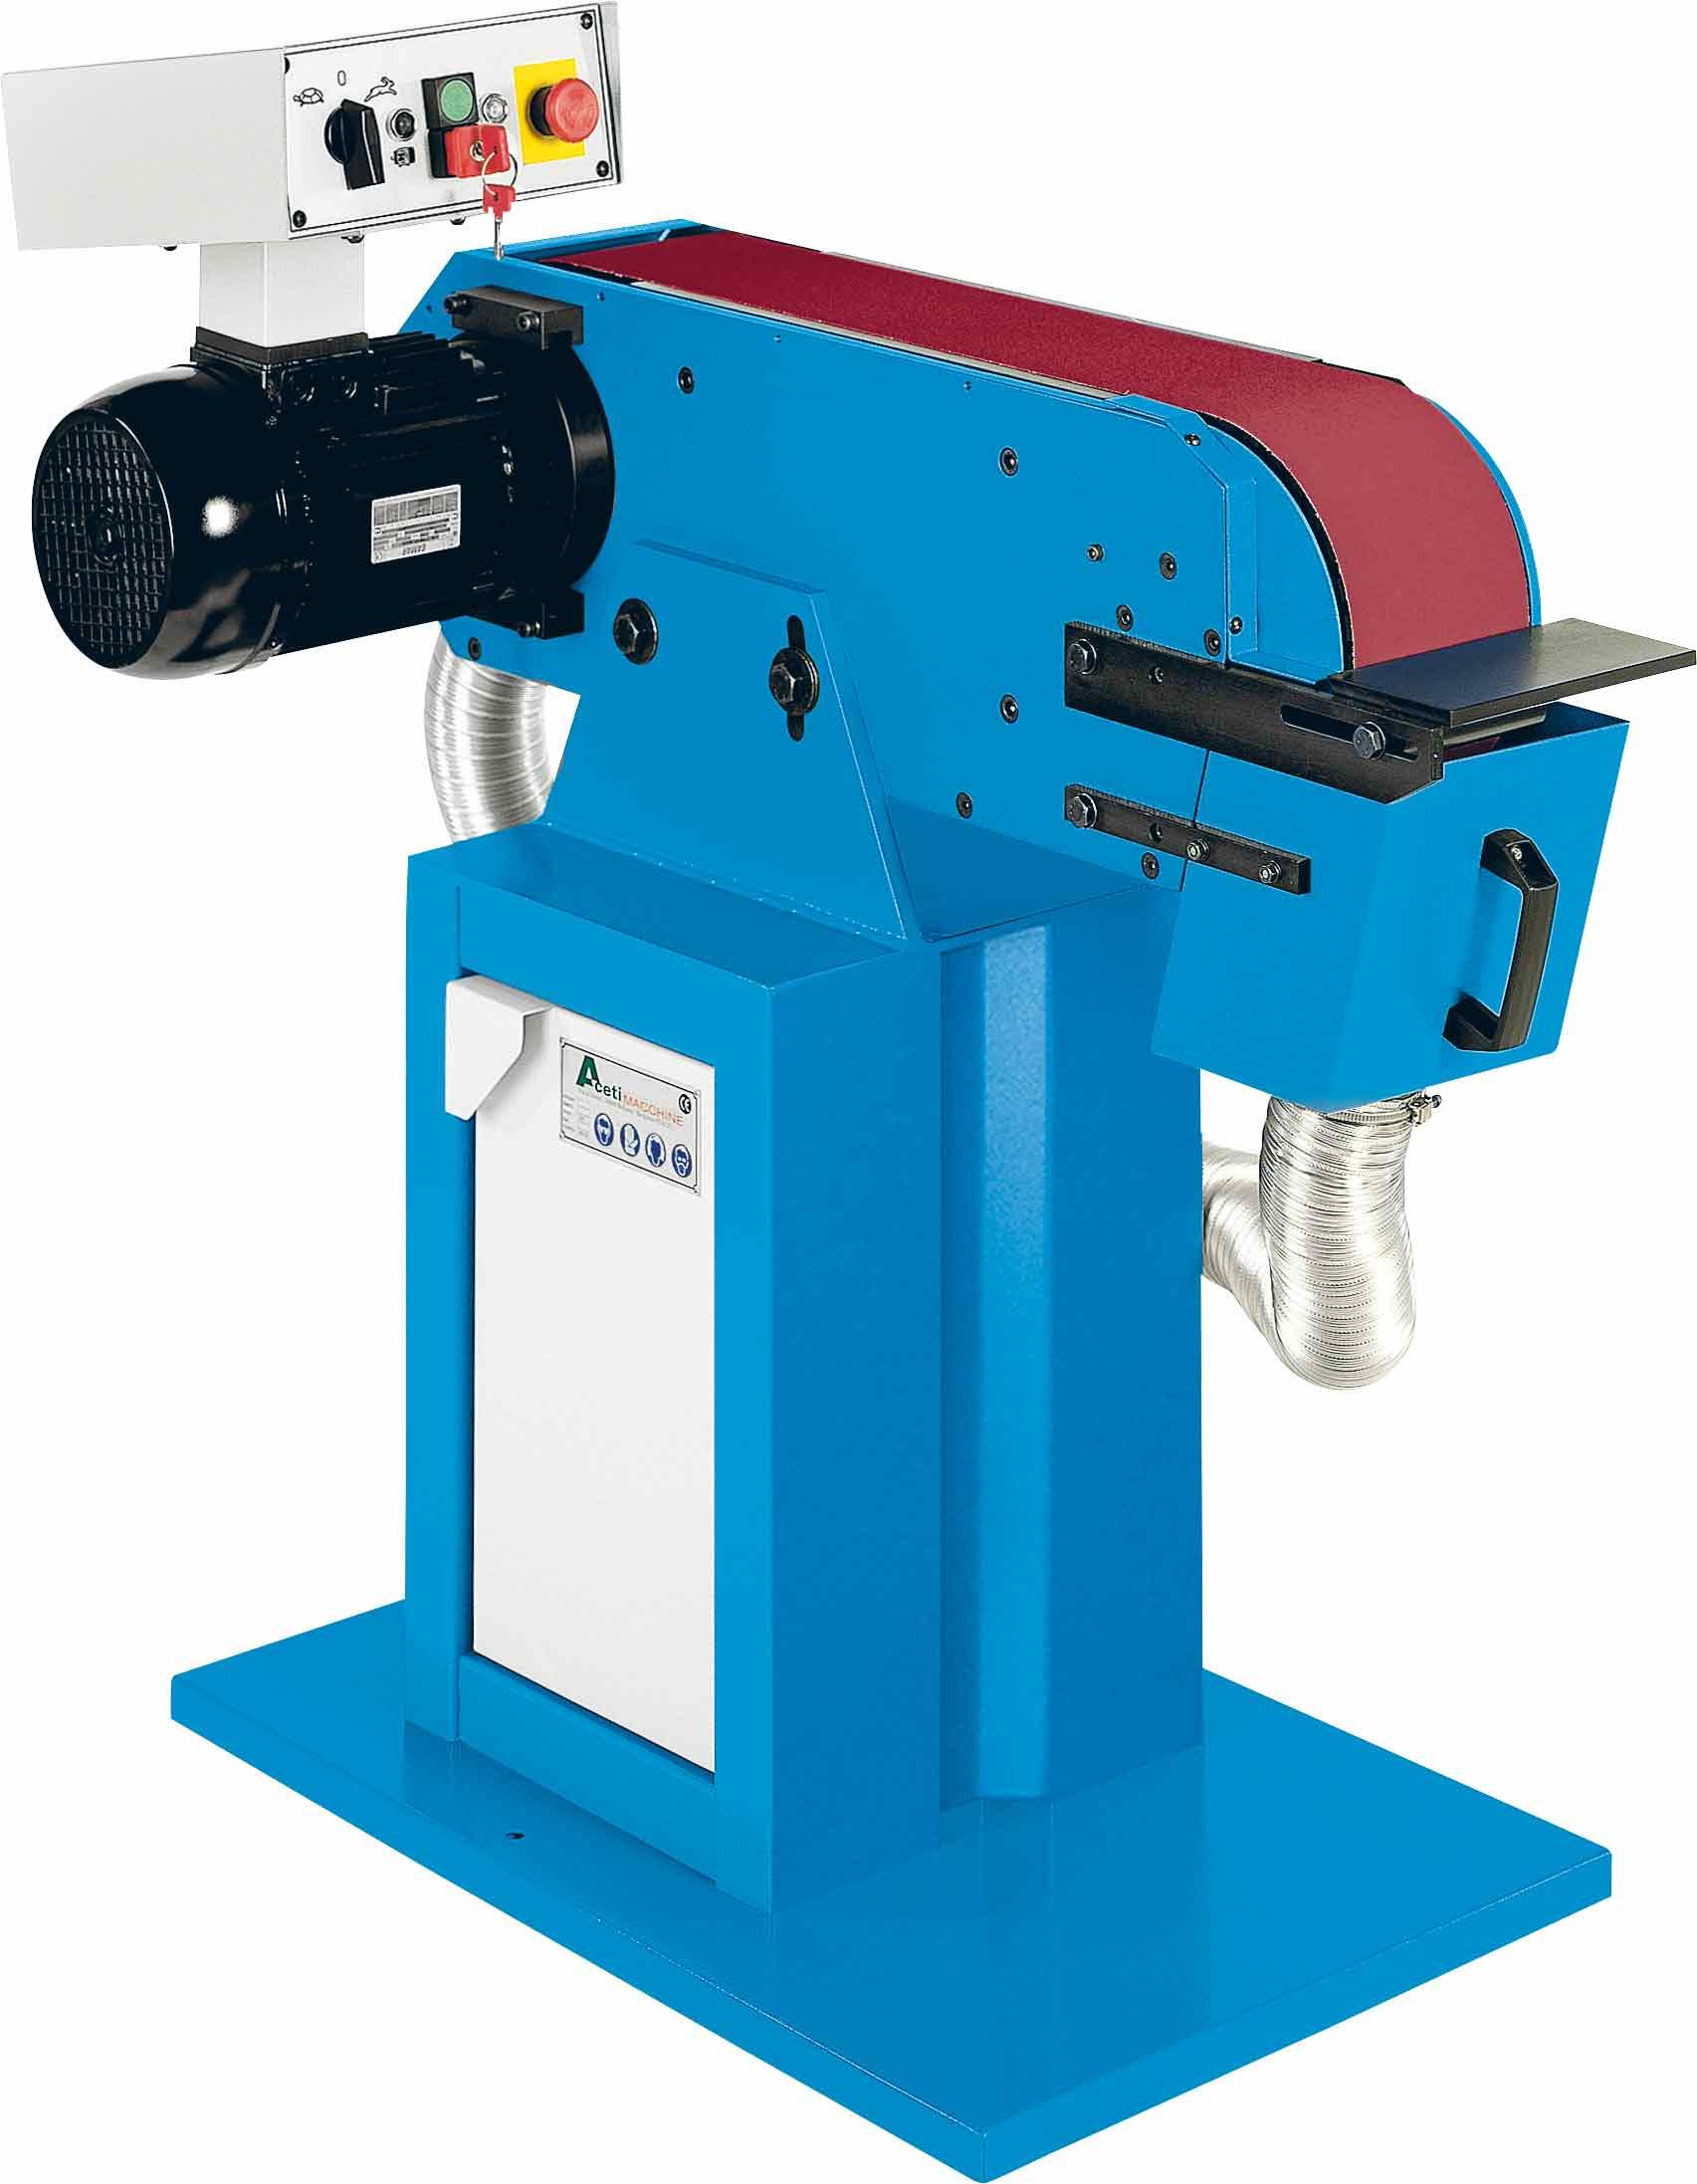 ART.38 - Belt grinding machine